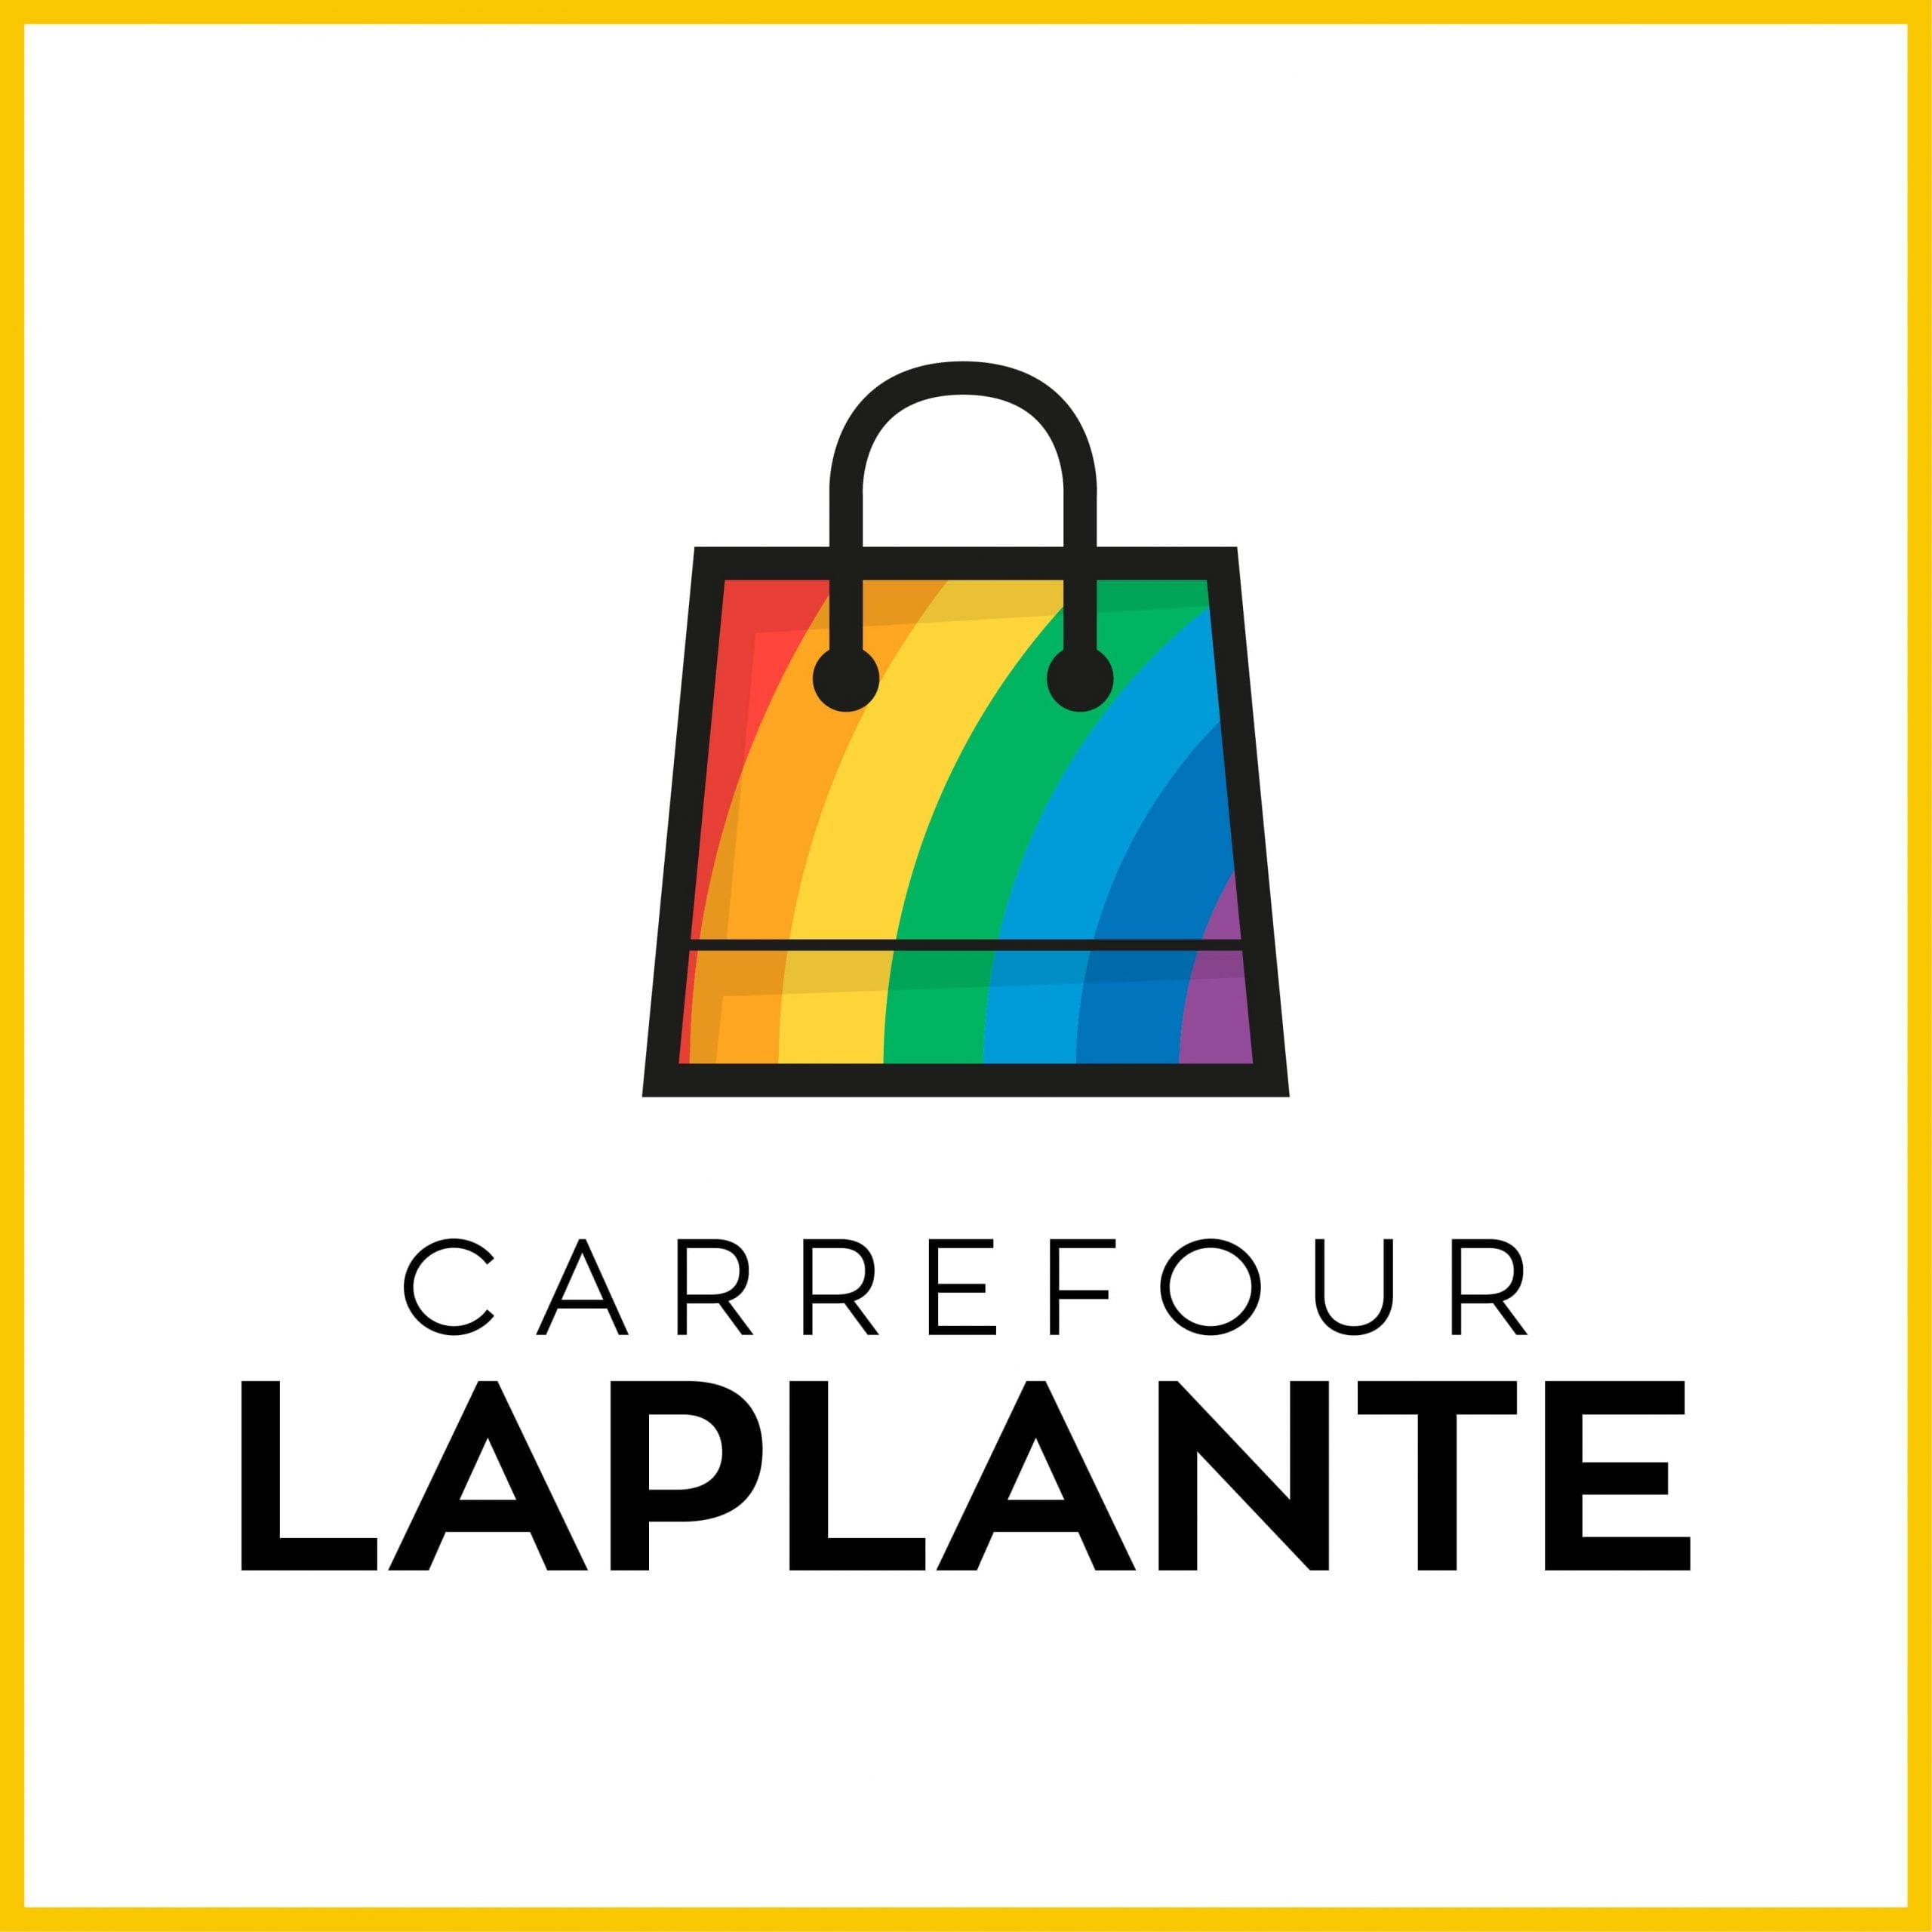 Carrefour Laplante - Adaptation de logo